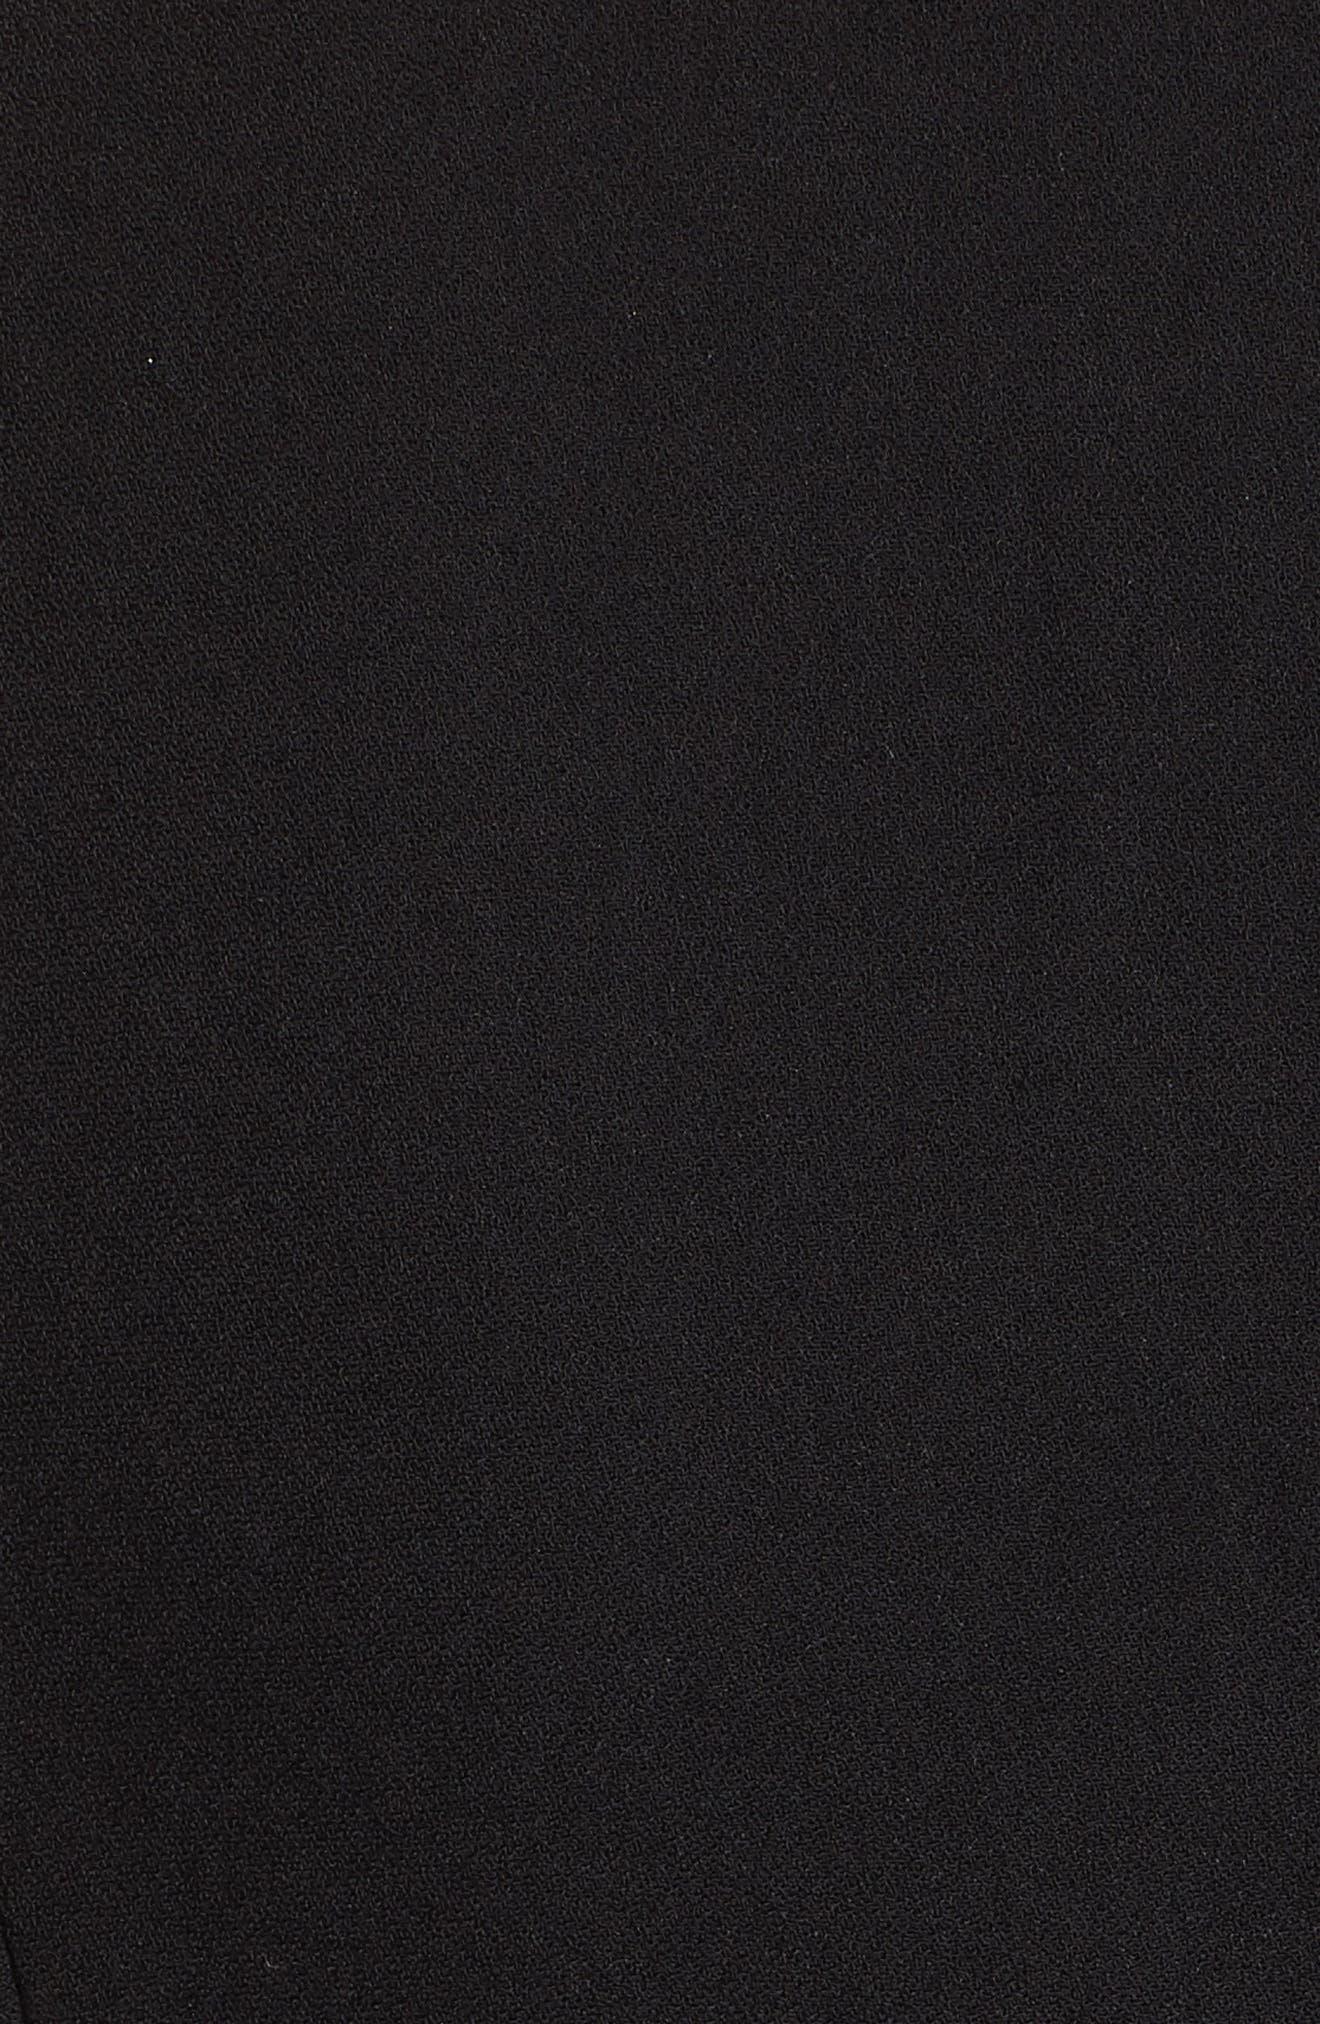 Lillien Graceful Embroidered Detail Dress,                             Alternate thumbnail 5, color,                             BLACK